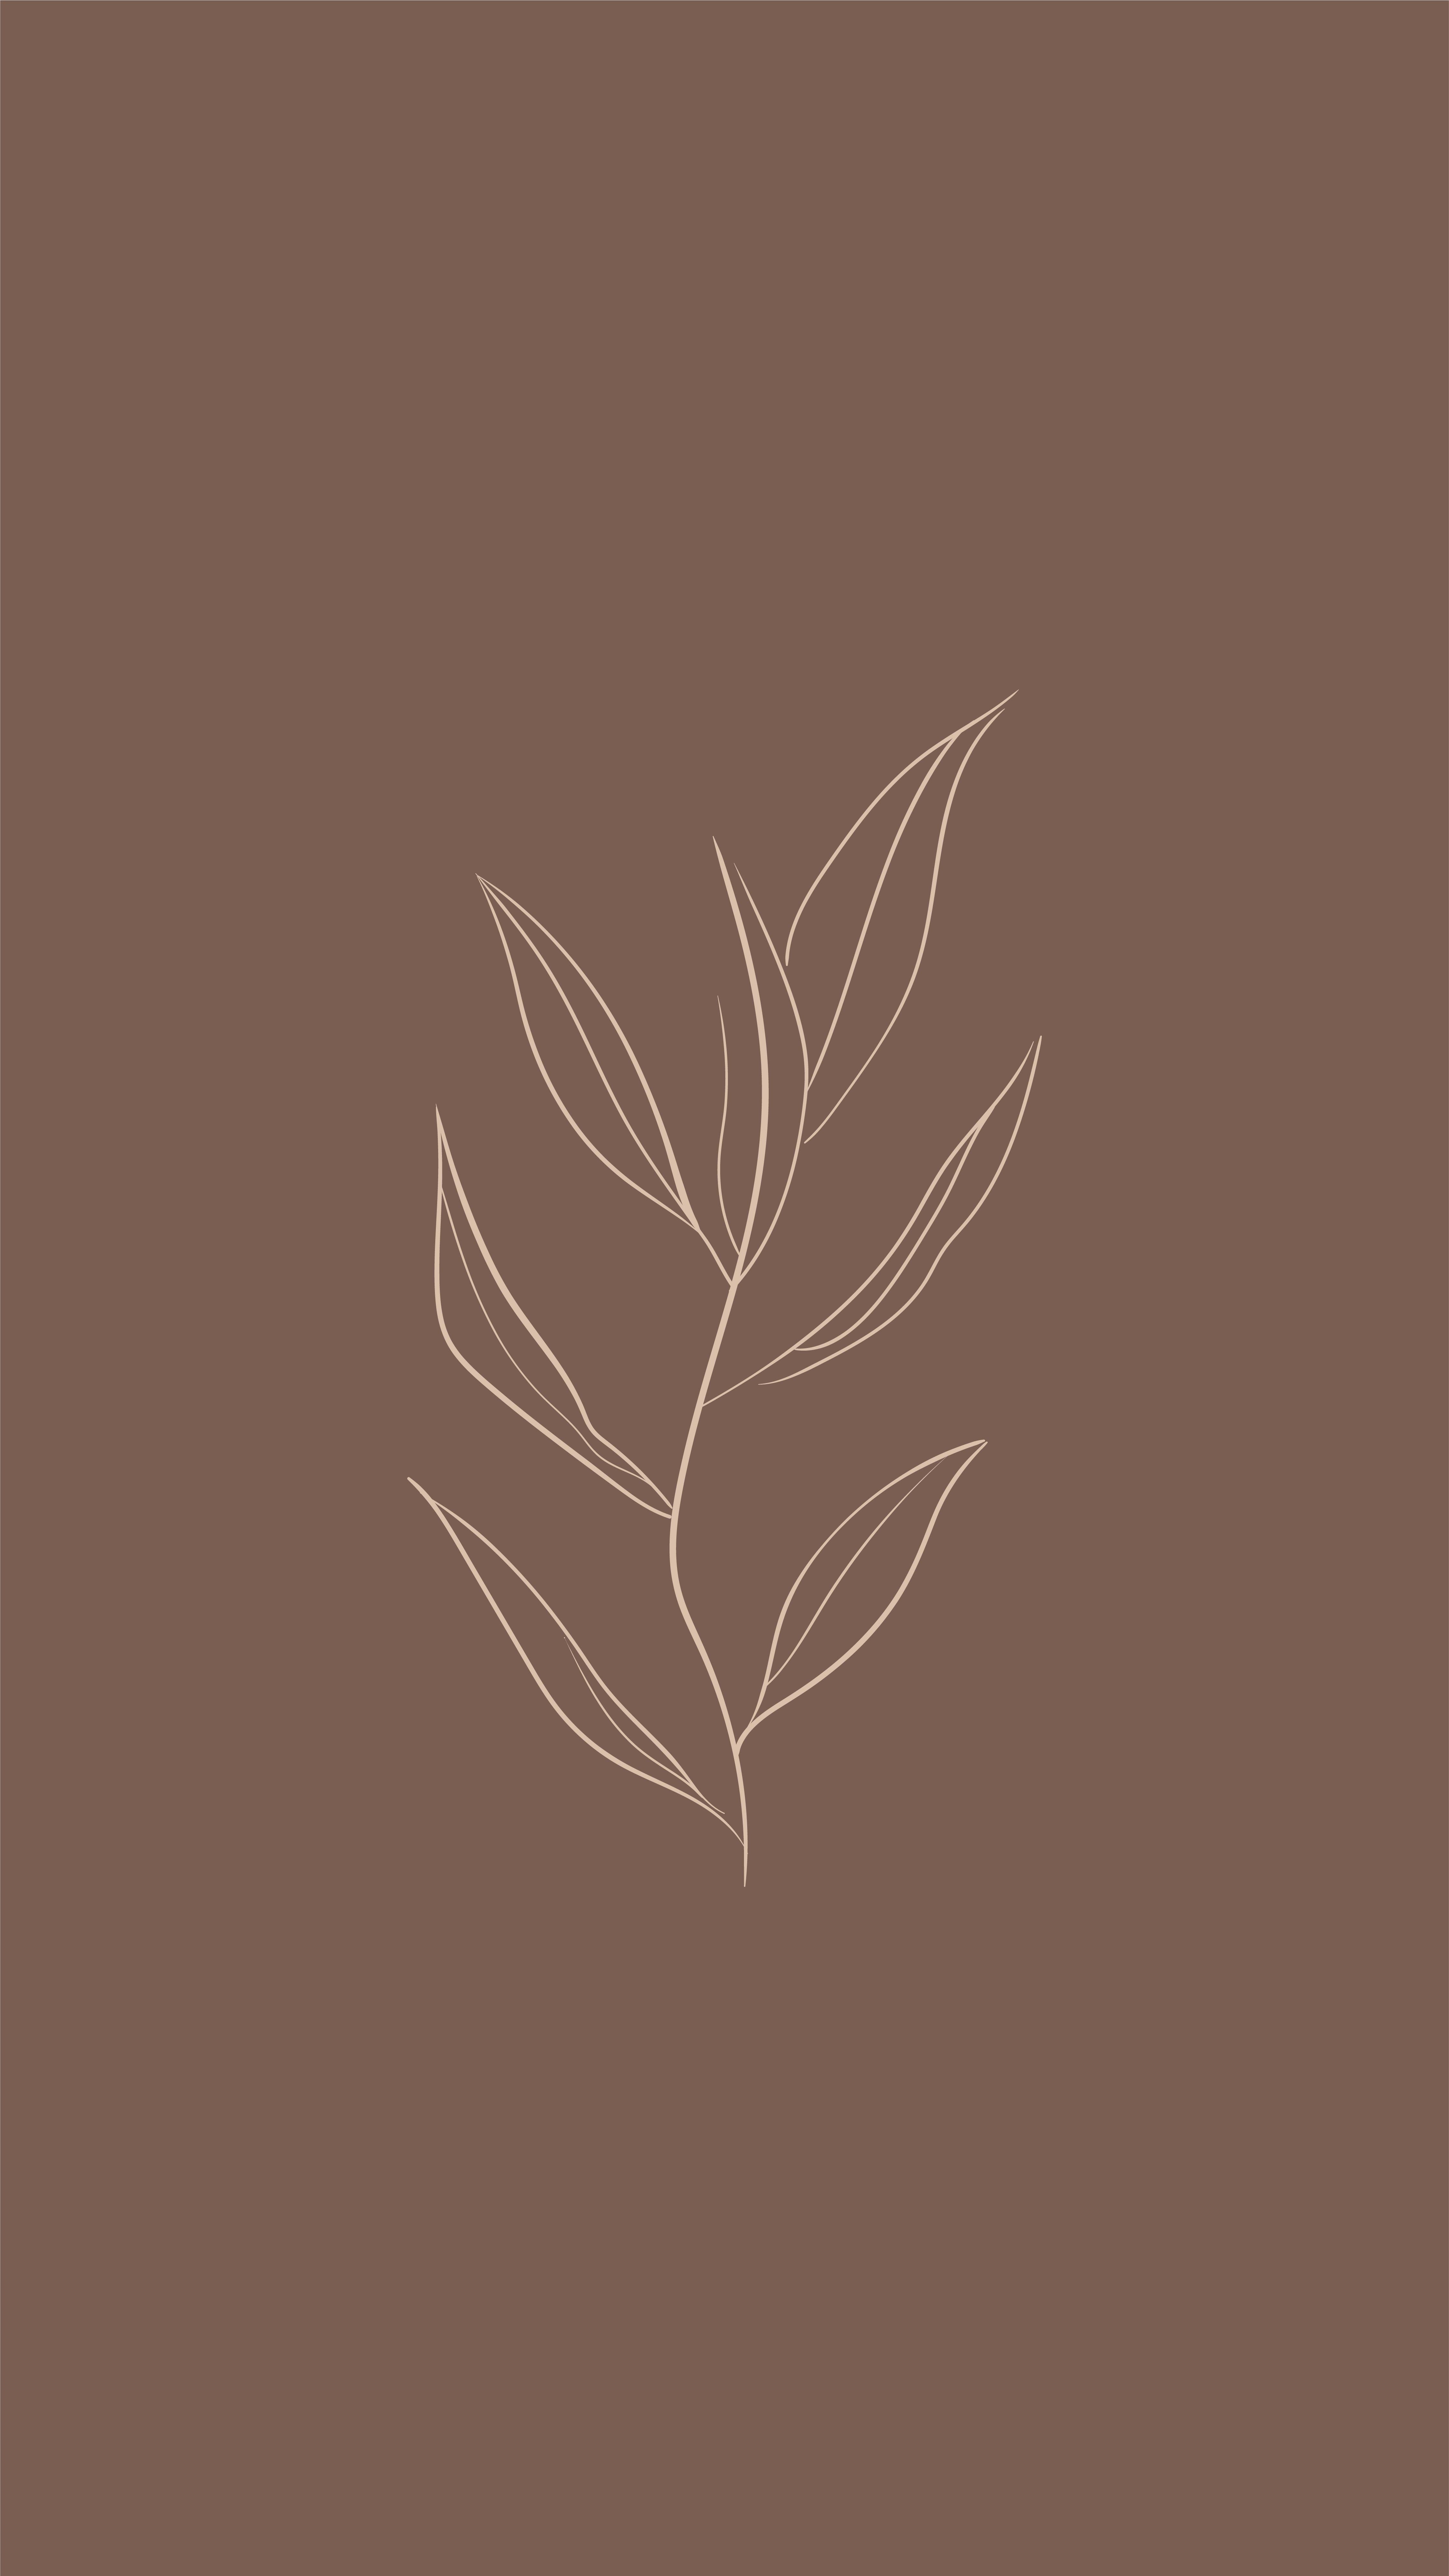 Wallpaper for iPhone - Instagram Background - Botanical line - Hand Drawn Flower